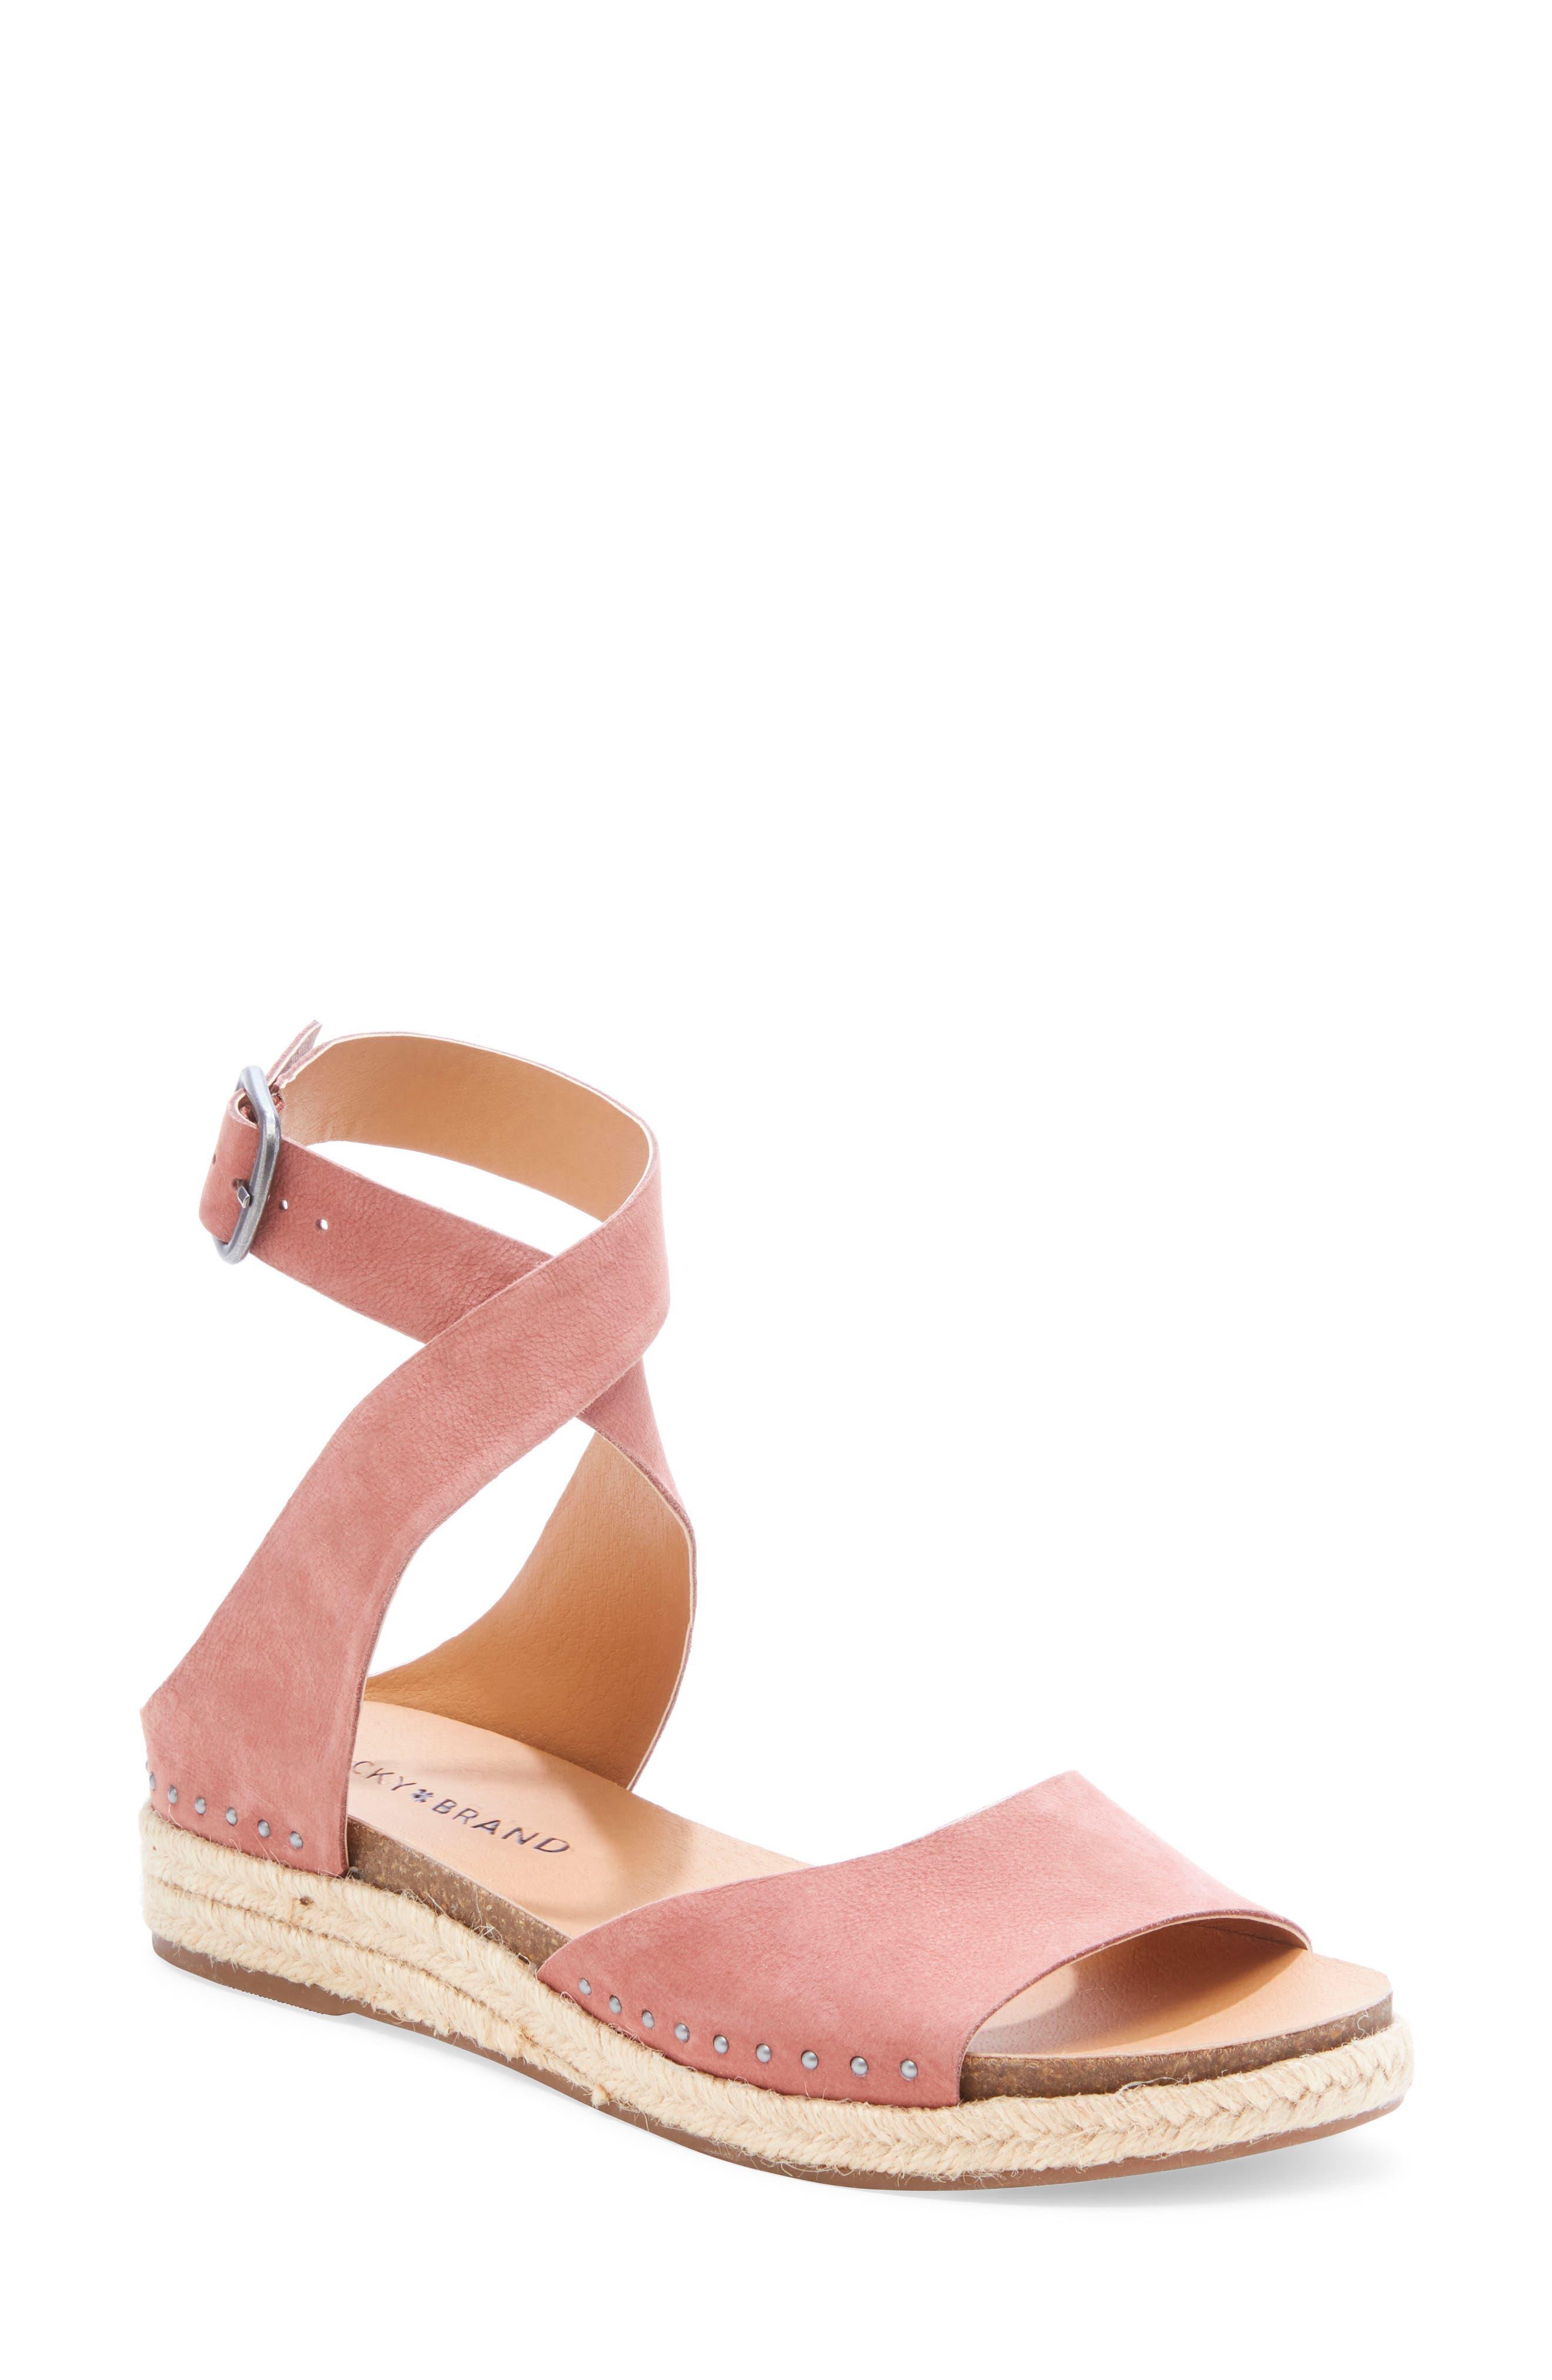 Lucky Brand Gladas Wedge Espadrille Sandal, Pink